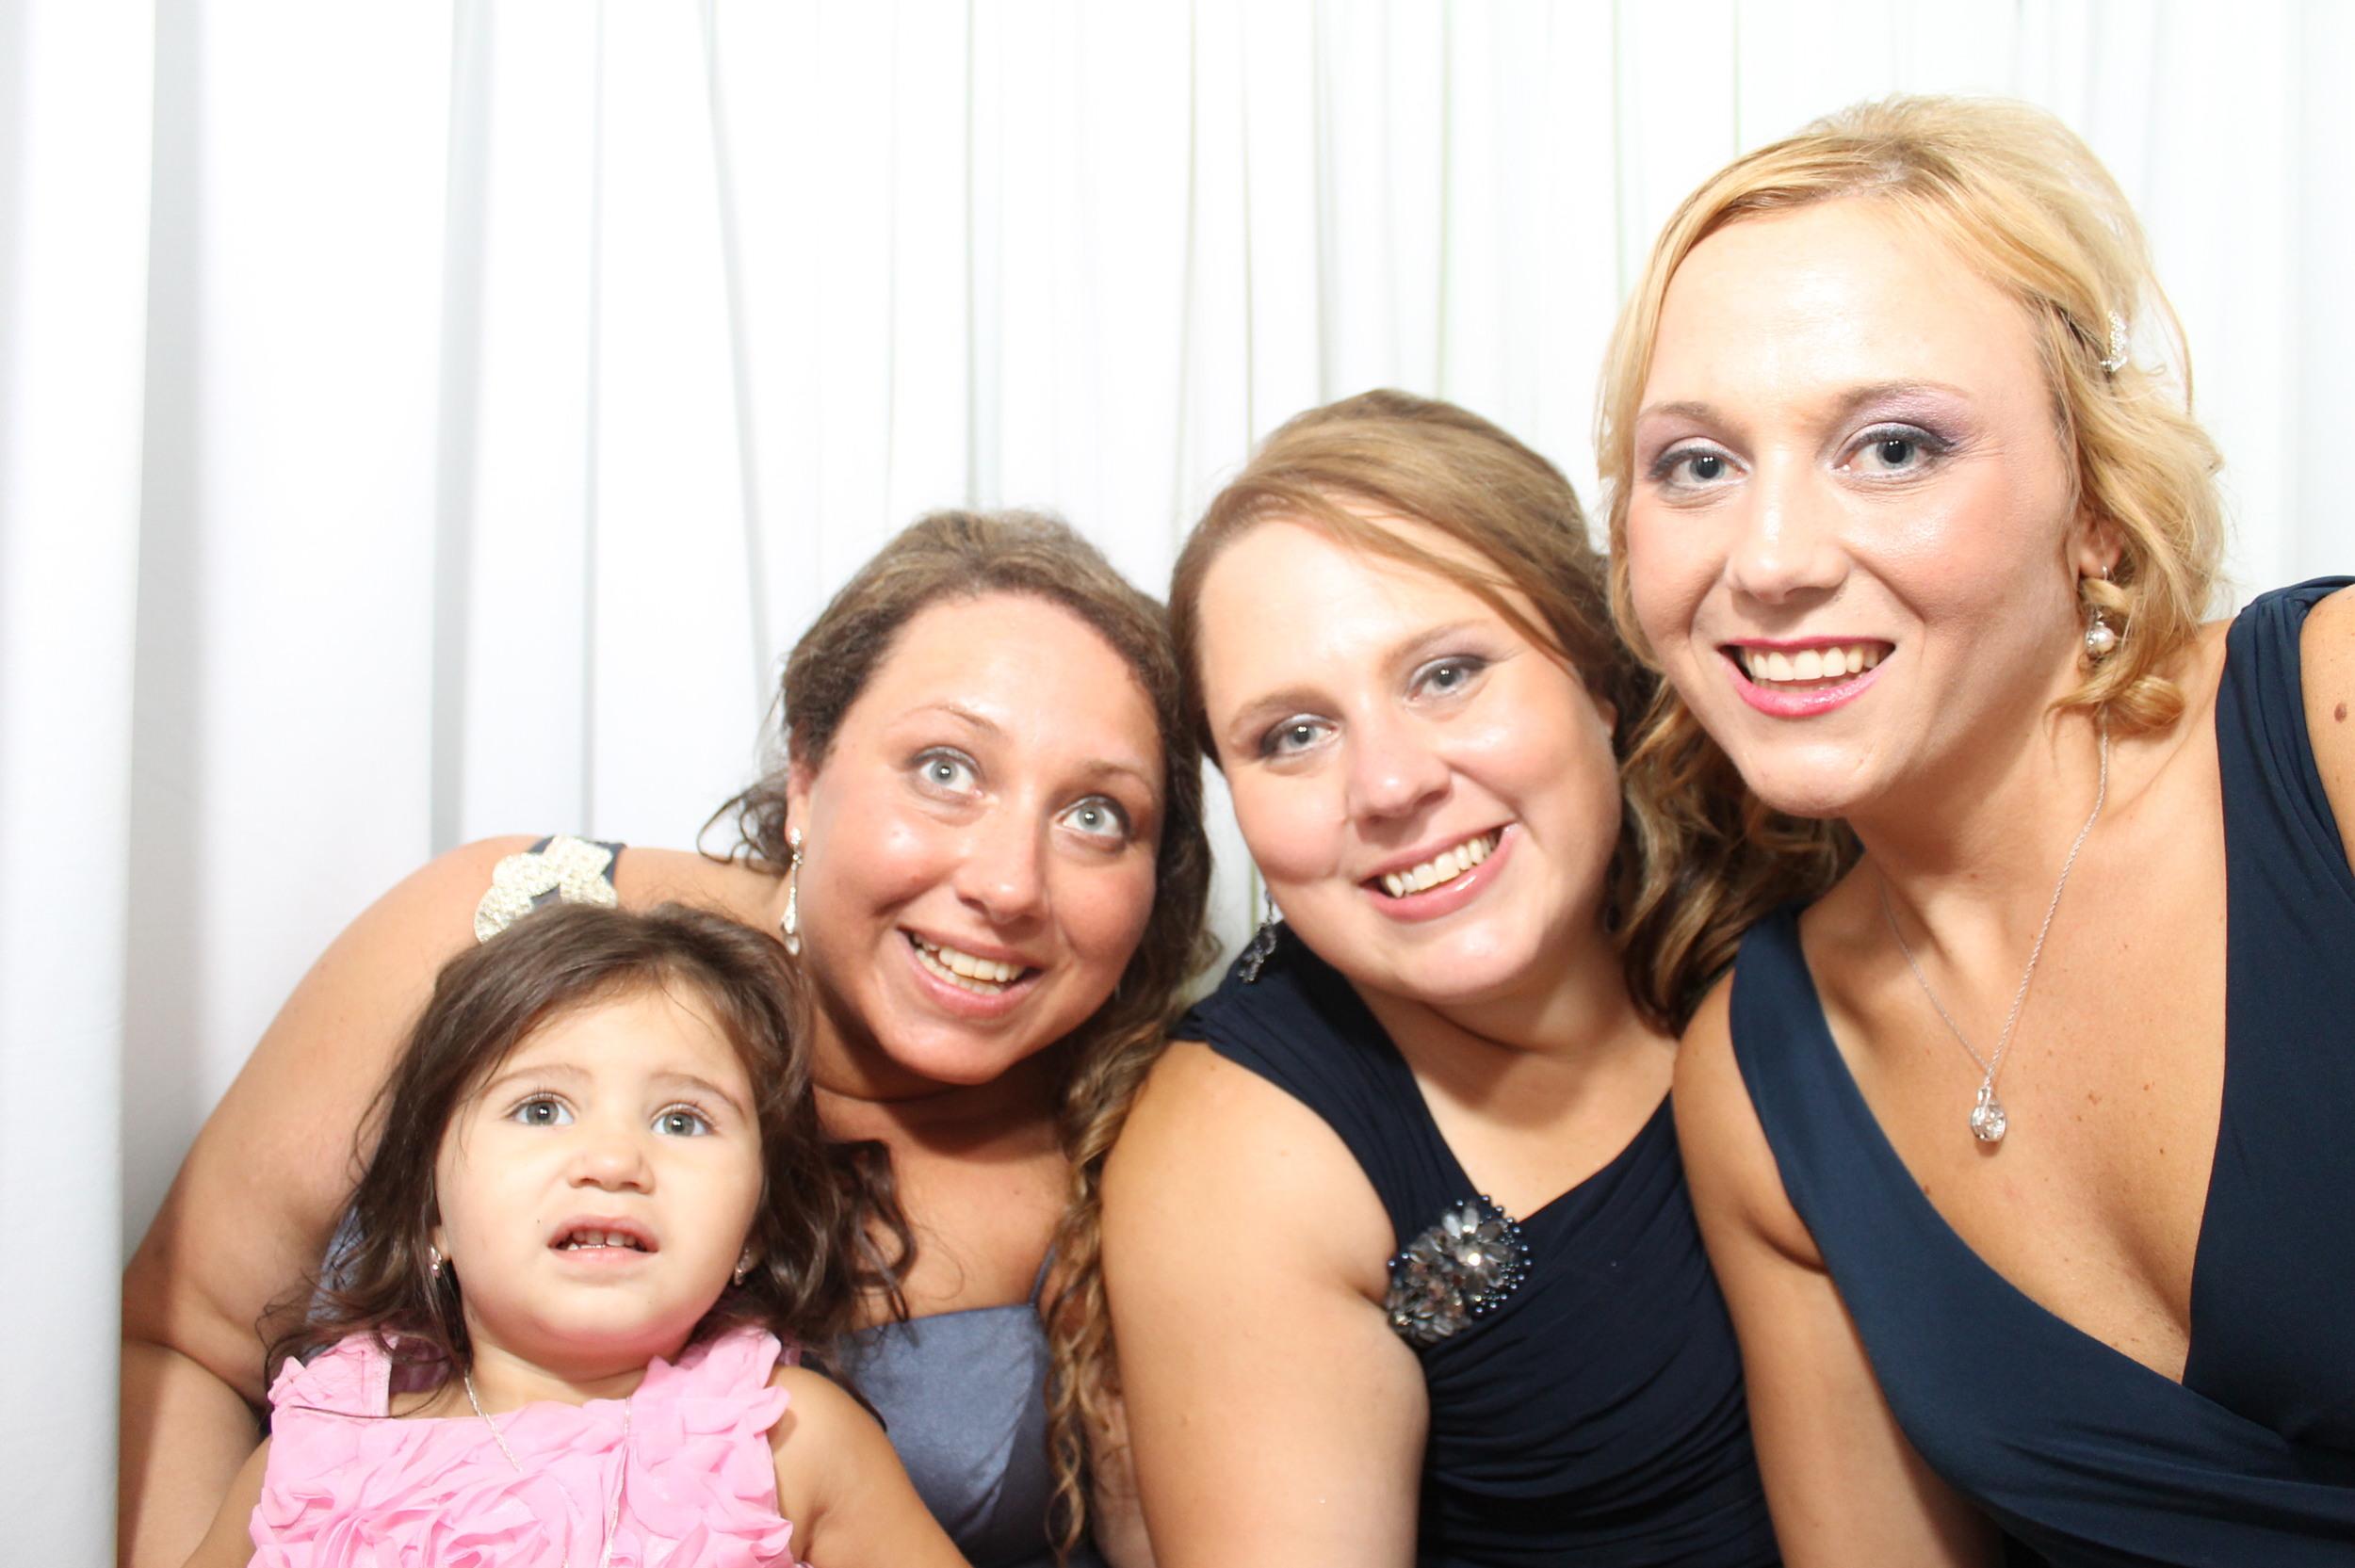 Snapshot Photobooths at Addison Park in Aberdeen, New Jersey